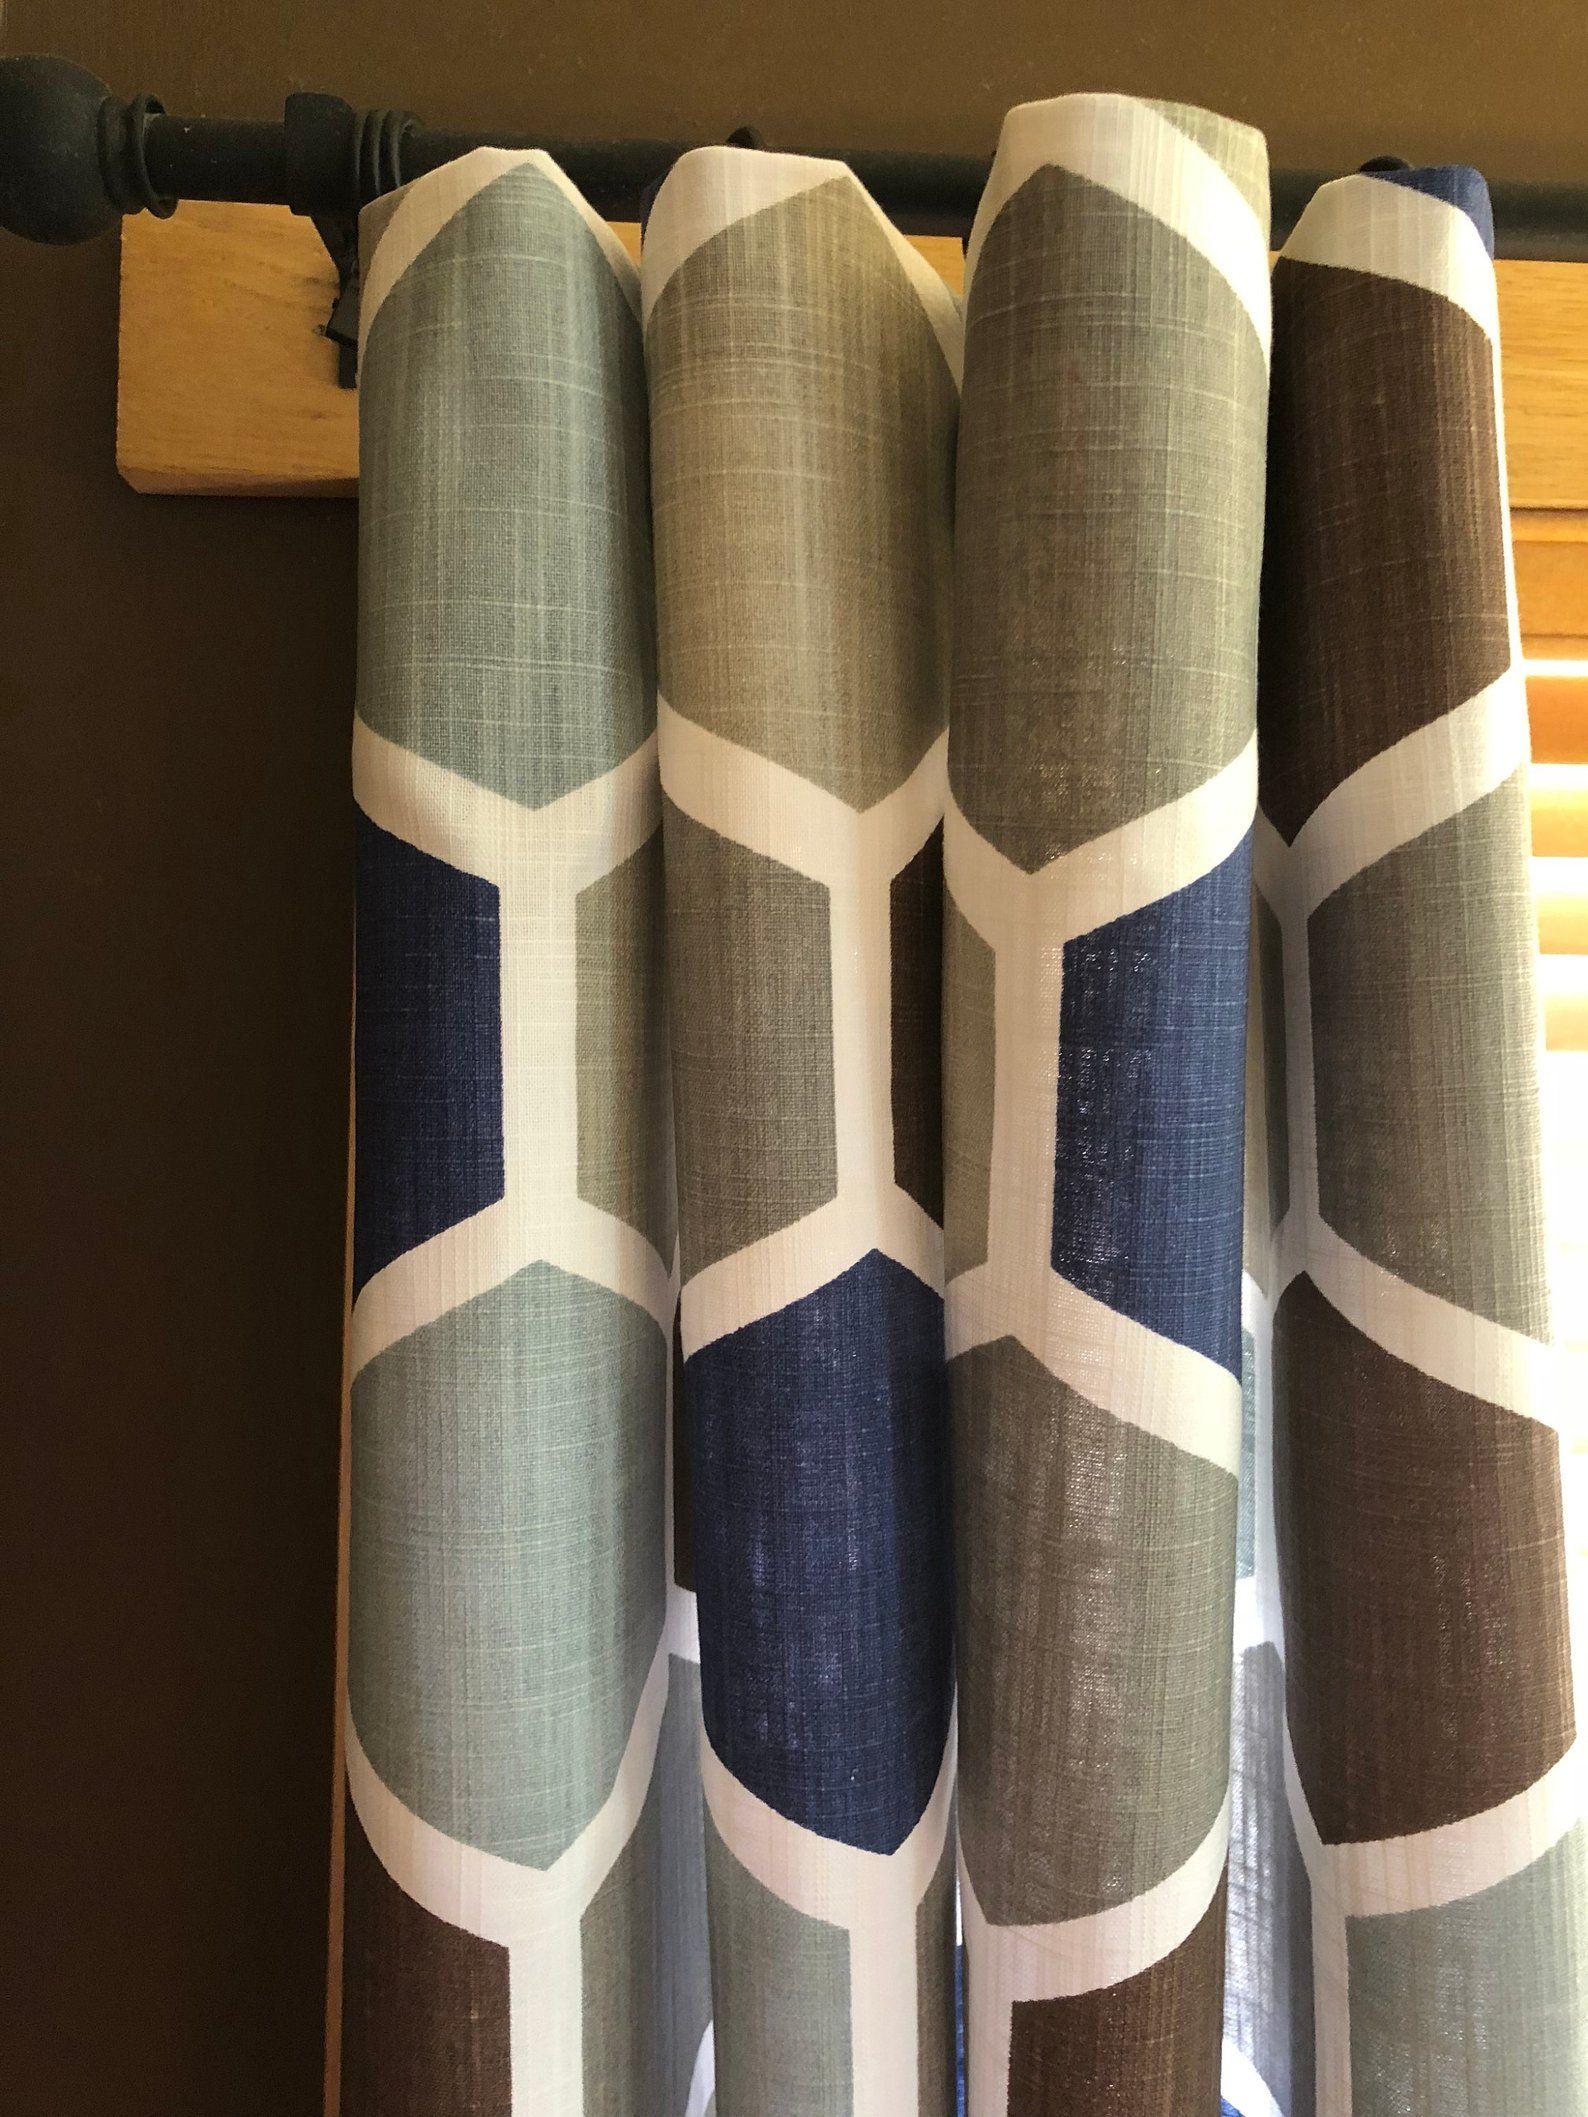 Hexagon Regal Blue Light Blue Grey Taupe Brown Curtains